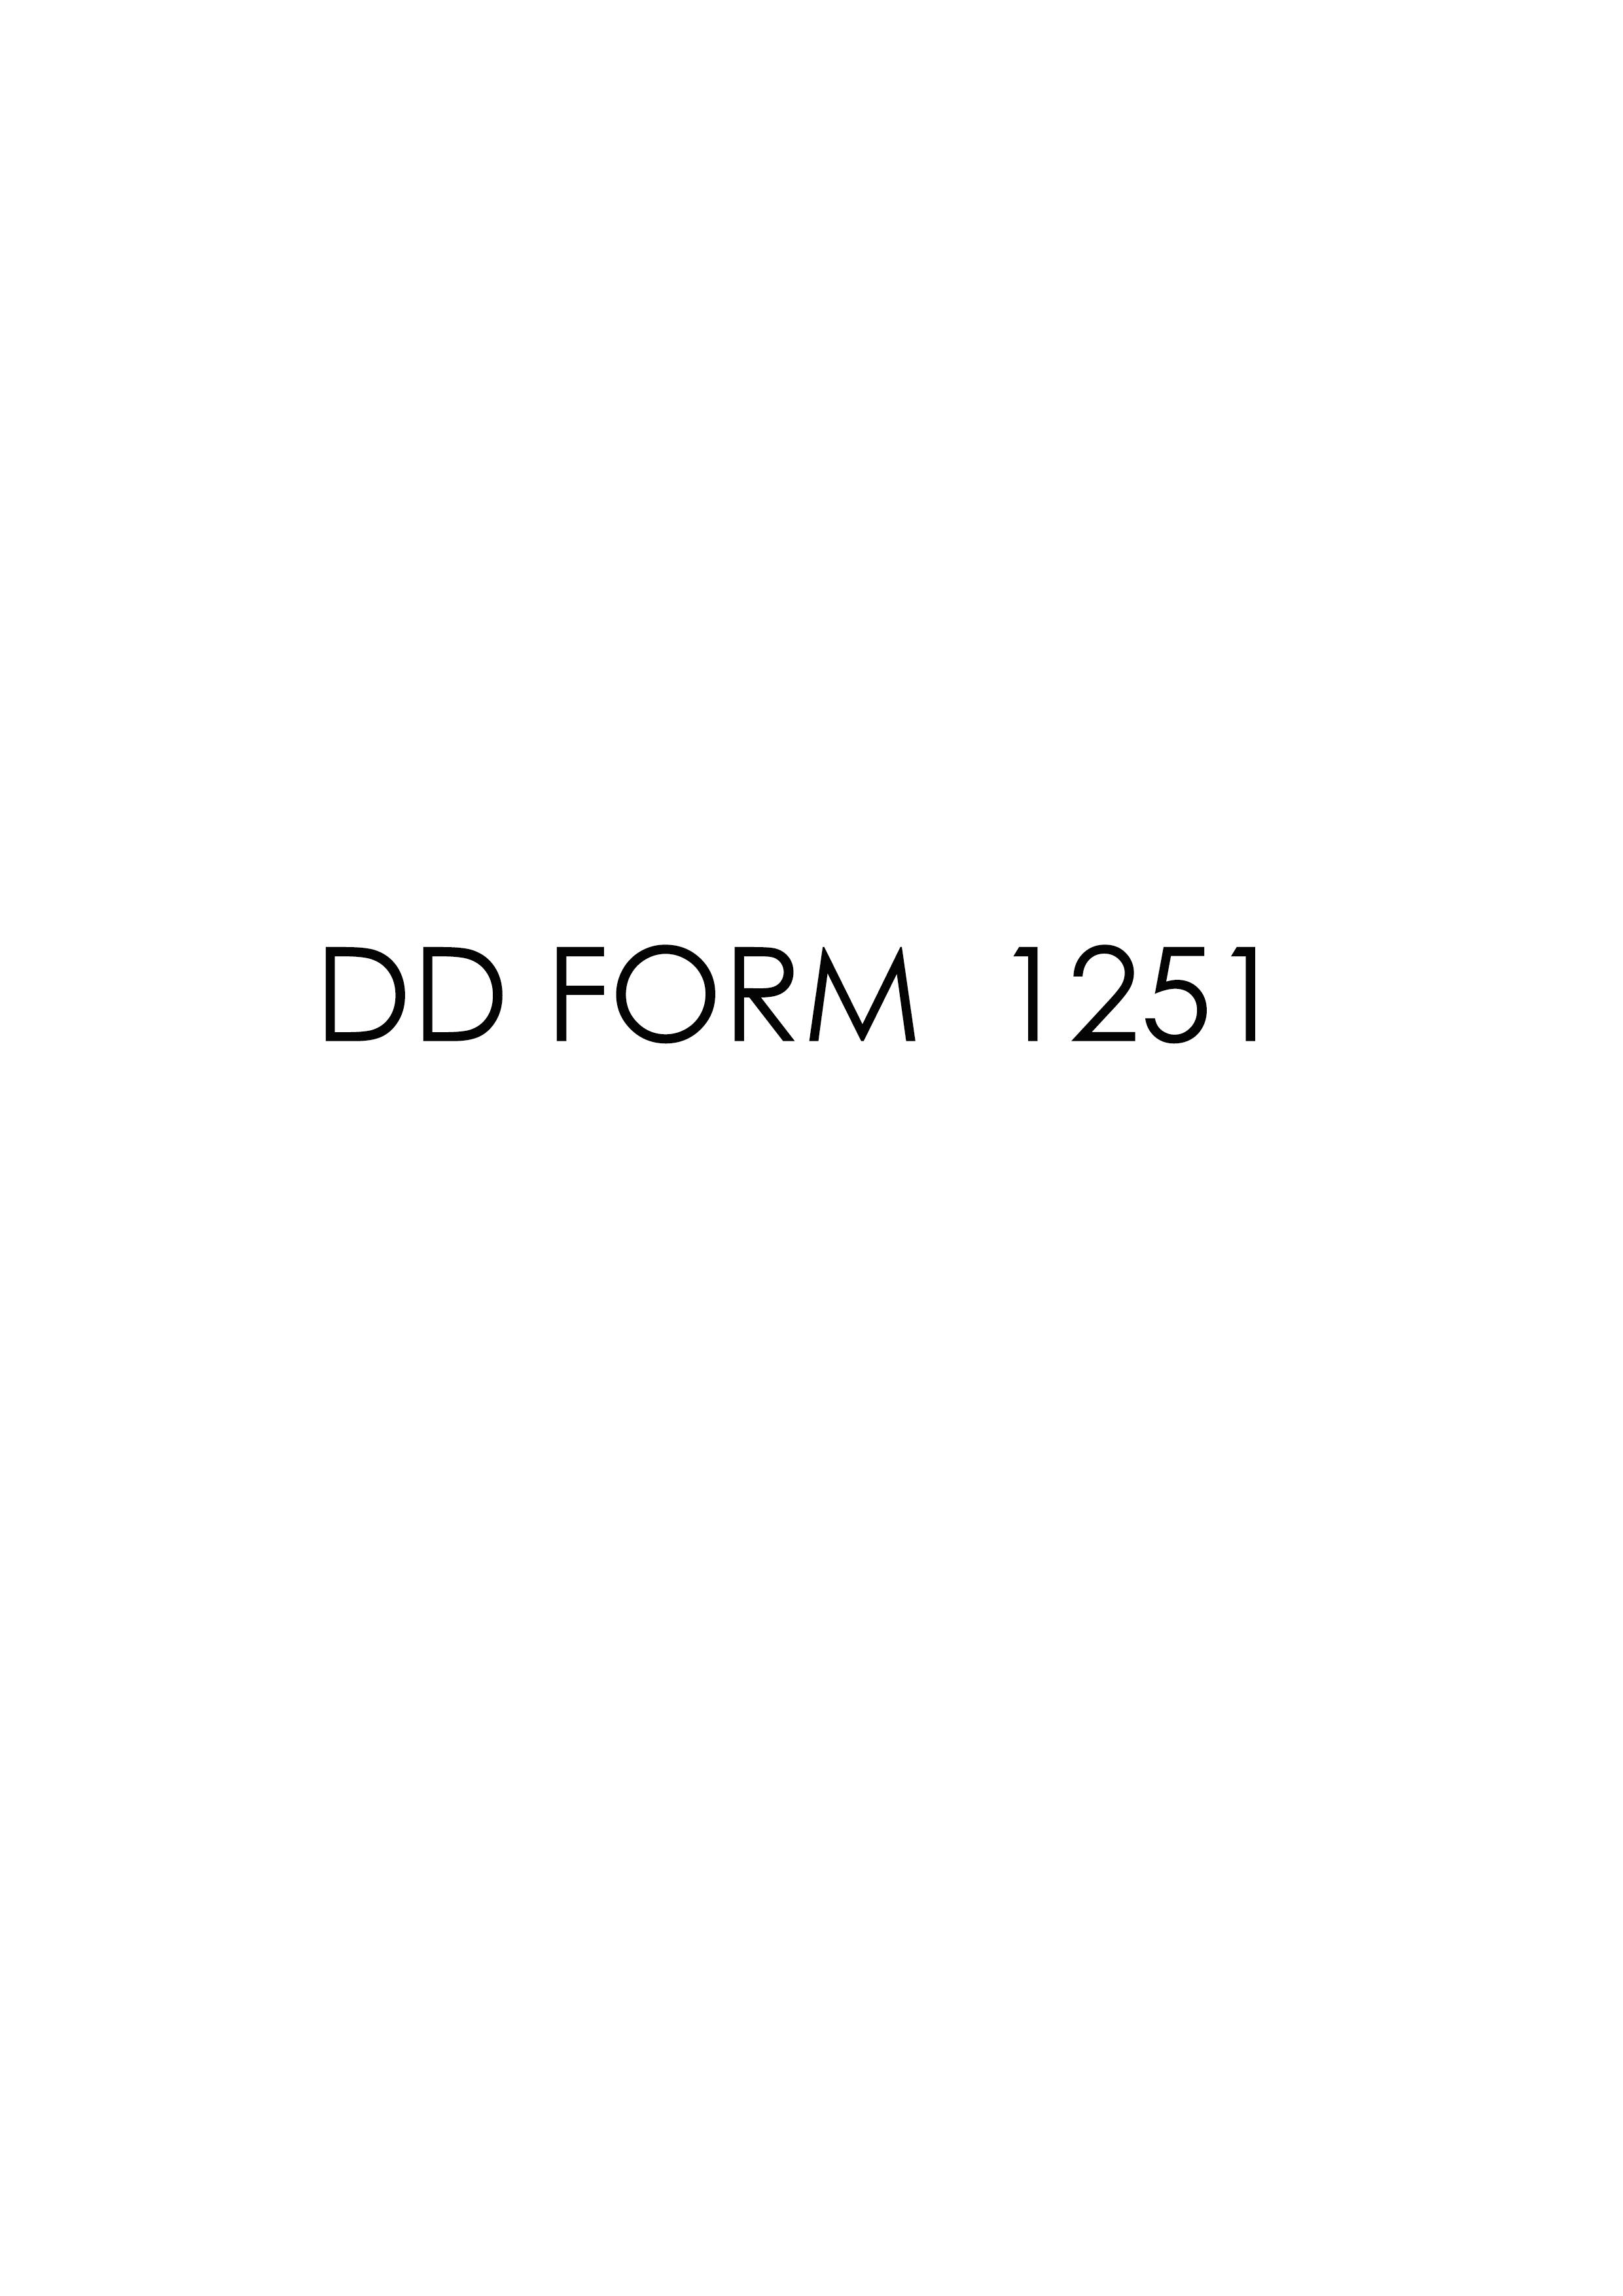 Download dd Form 1251 Free